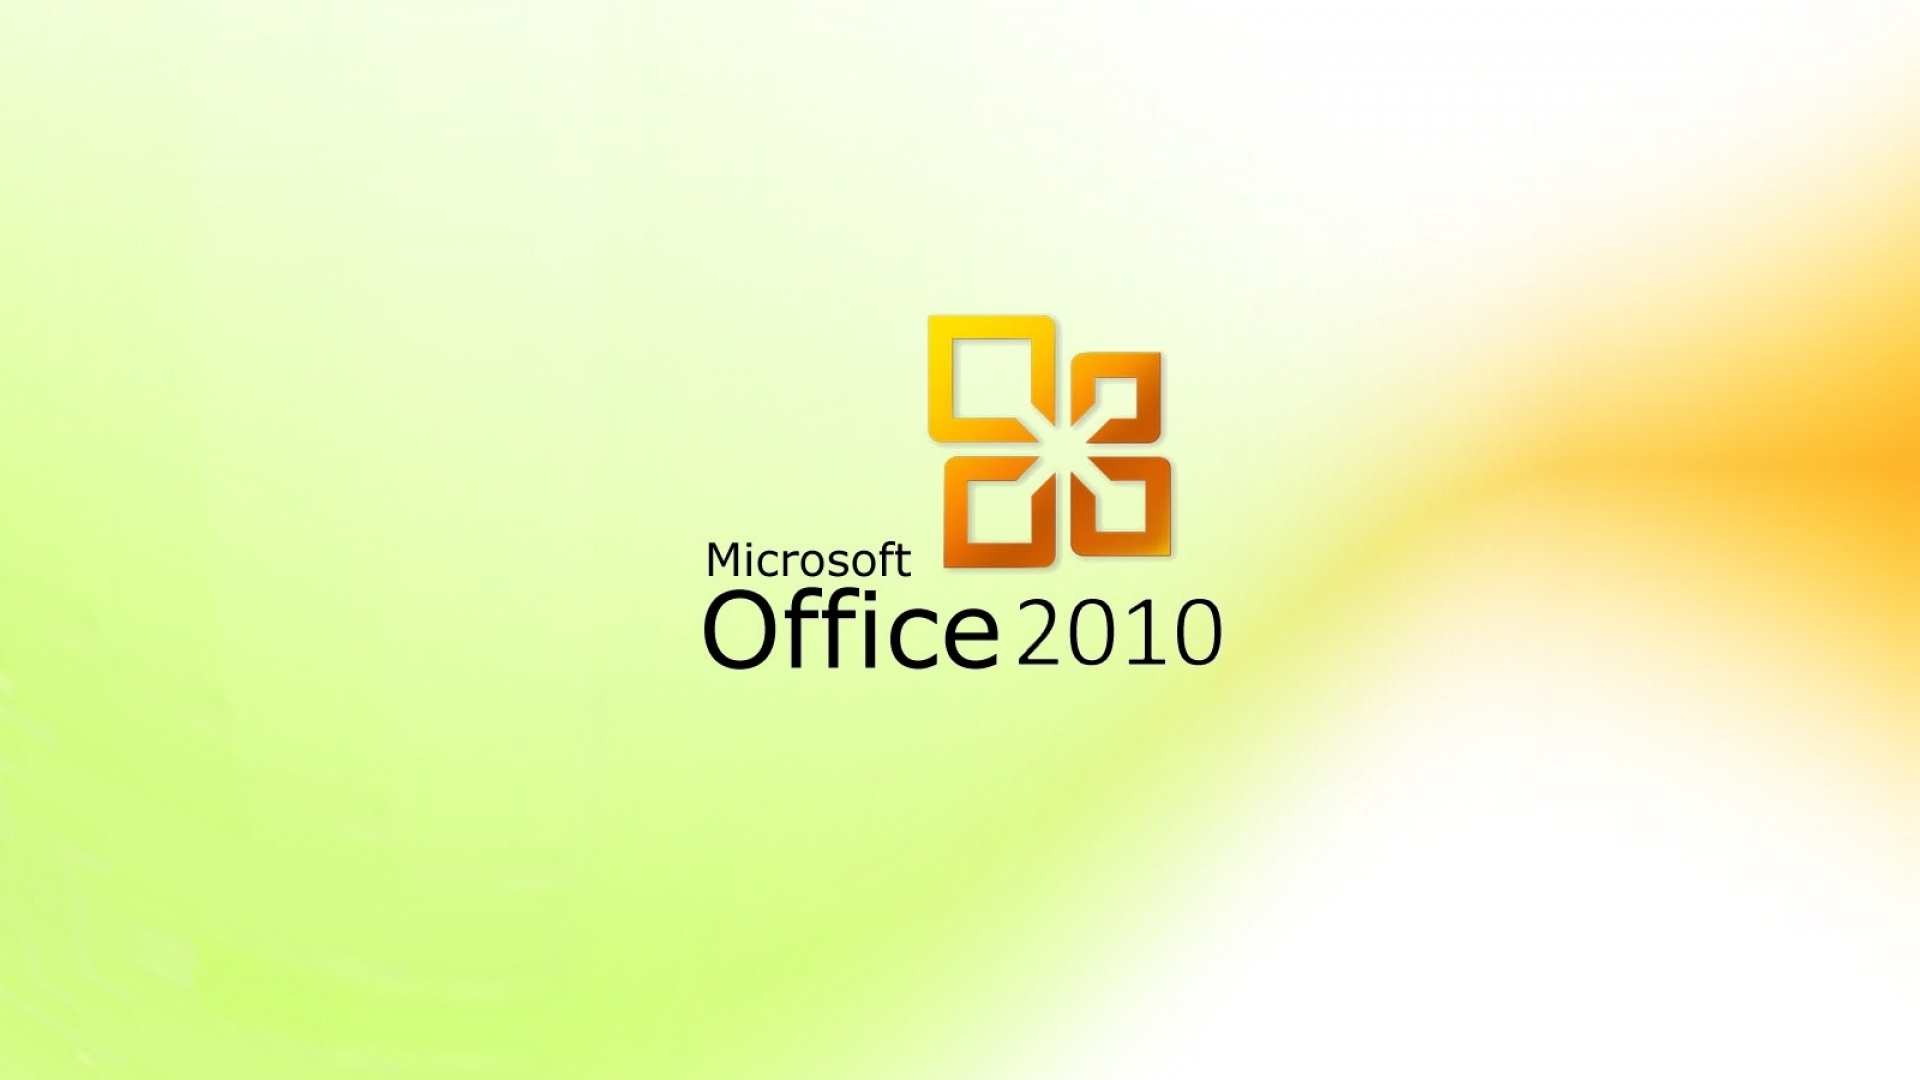 Download Wallpaper 1920x1080 Microsoft Office 2010